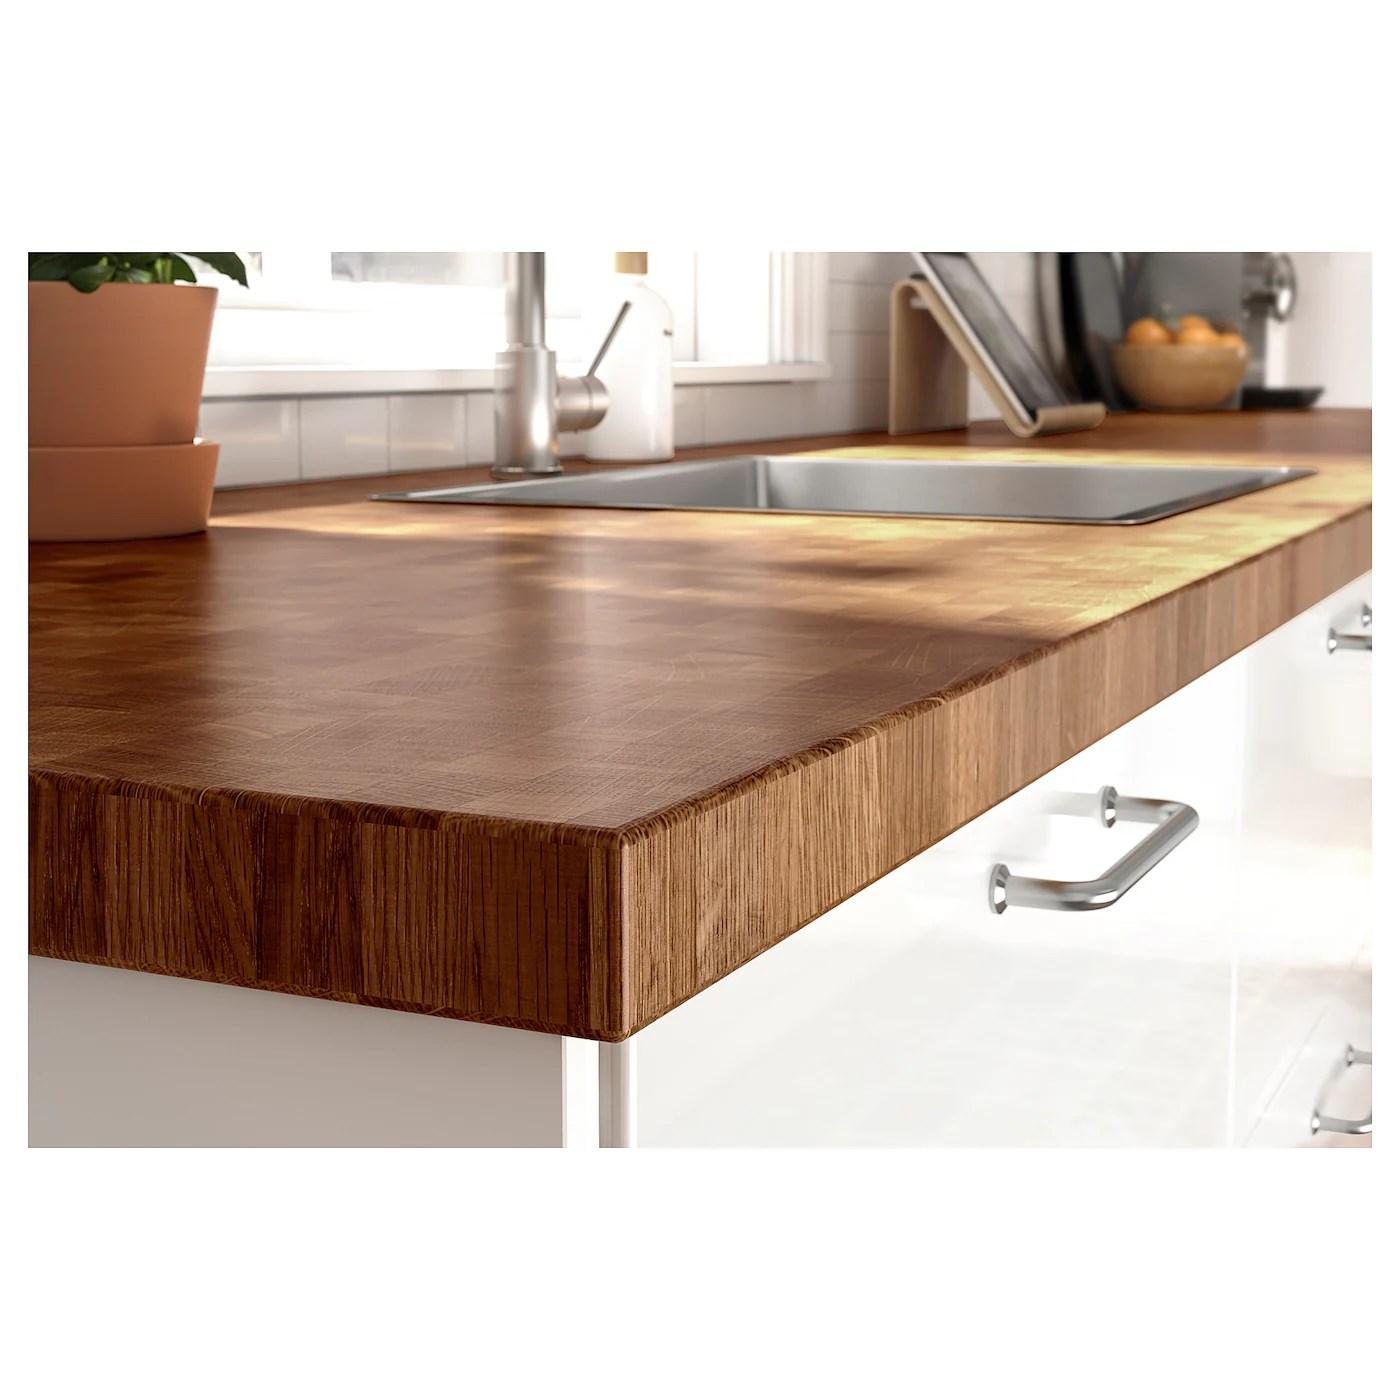 Skogsa Plan De Travail Chene Plaque 246x3 Ikea